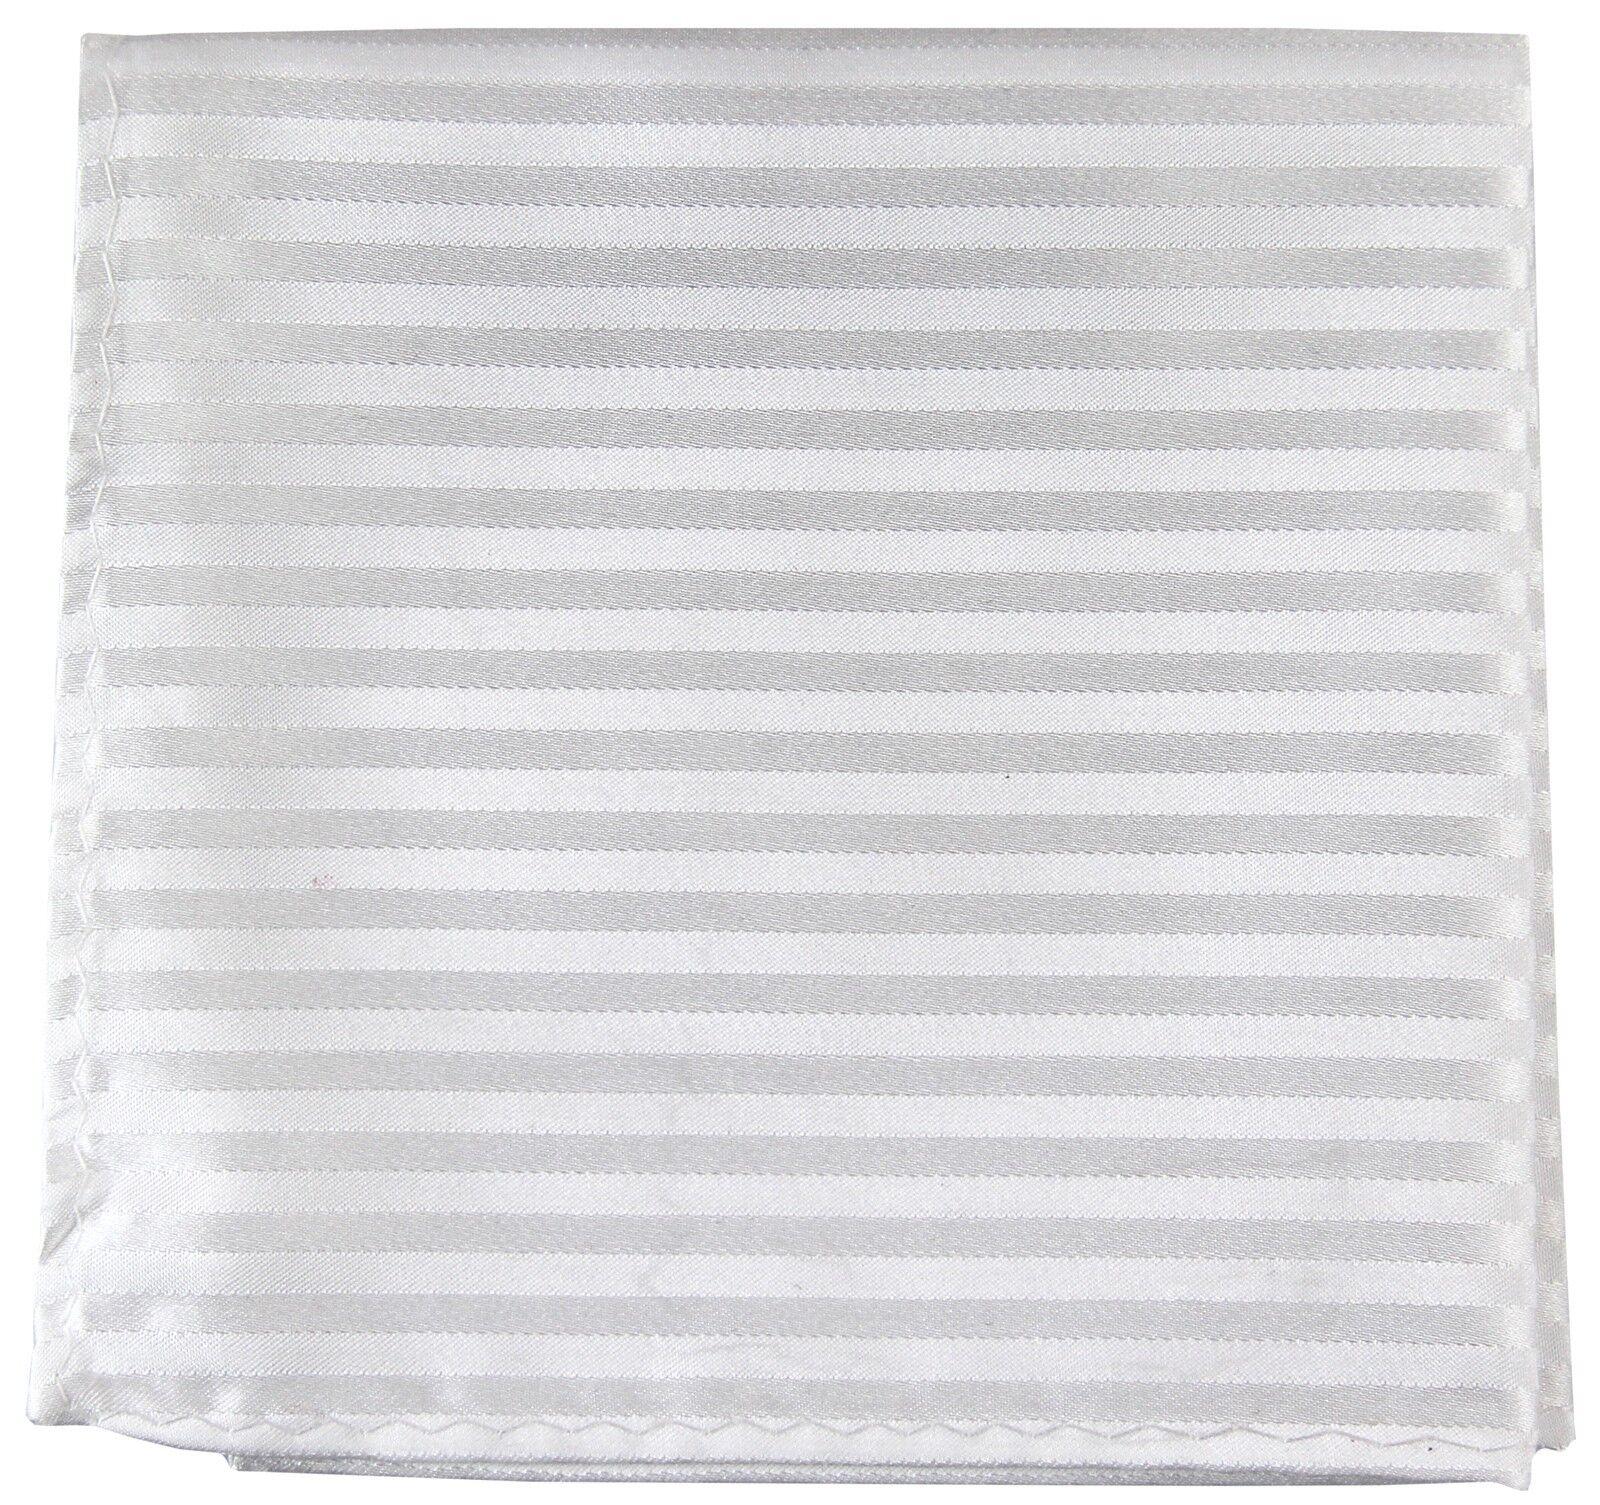 New Men's Polyester Woven pocket square hankie only white tone on tone stripes